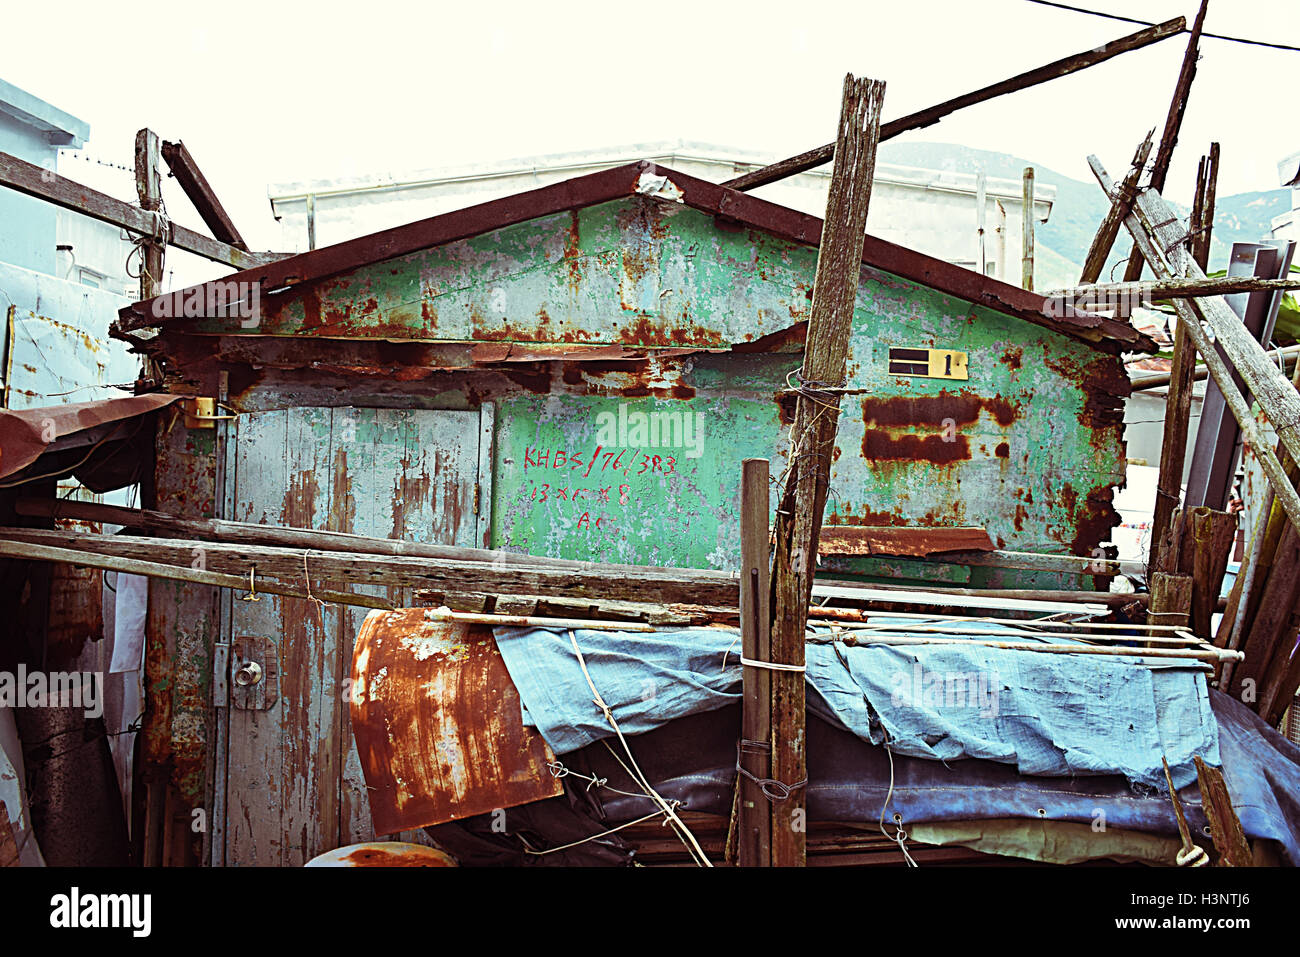 Old rusted house in Tai O fishing village, Lantau island, Hong Kong S.A.R. - Stock Image